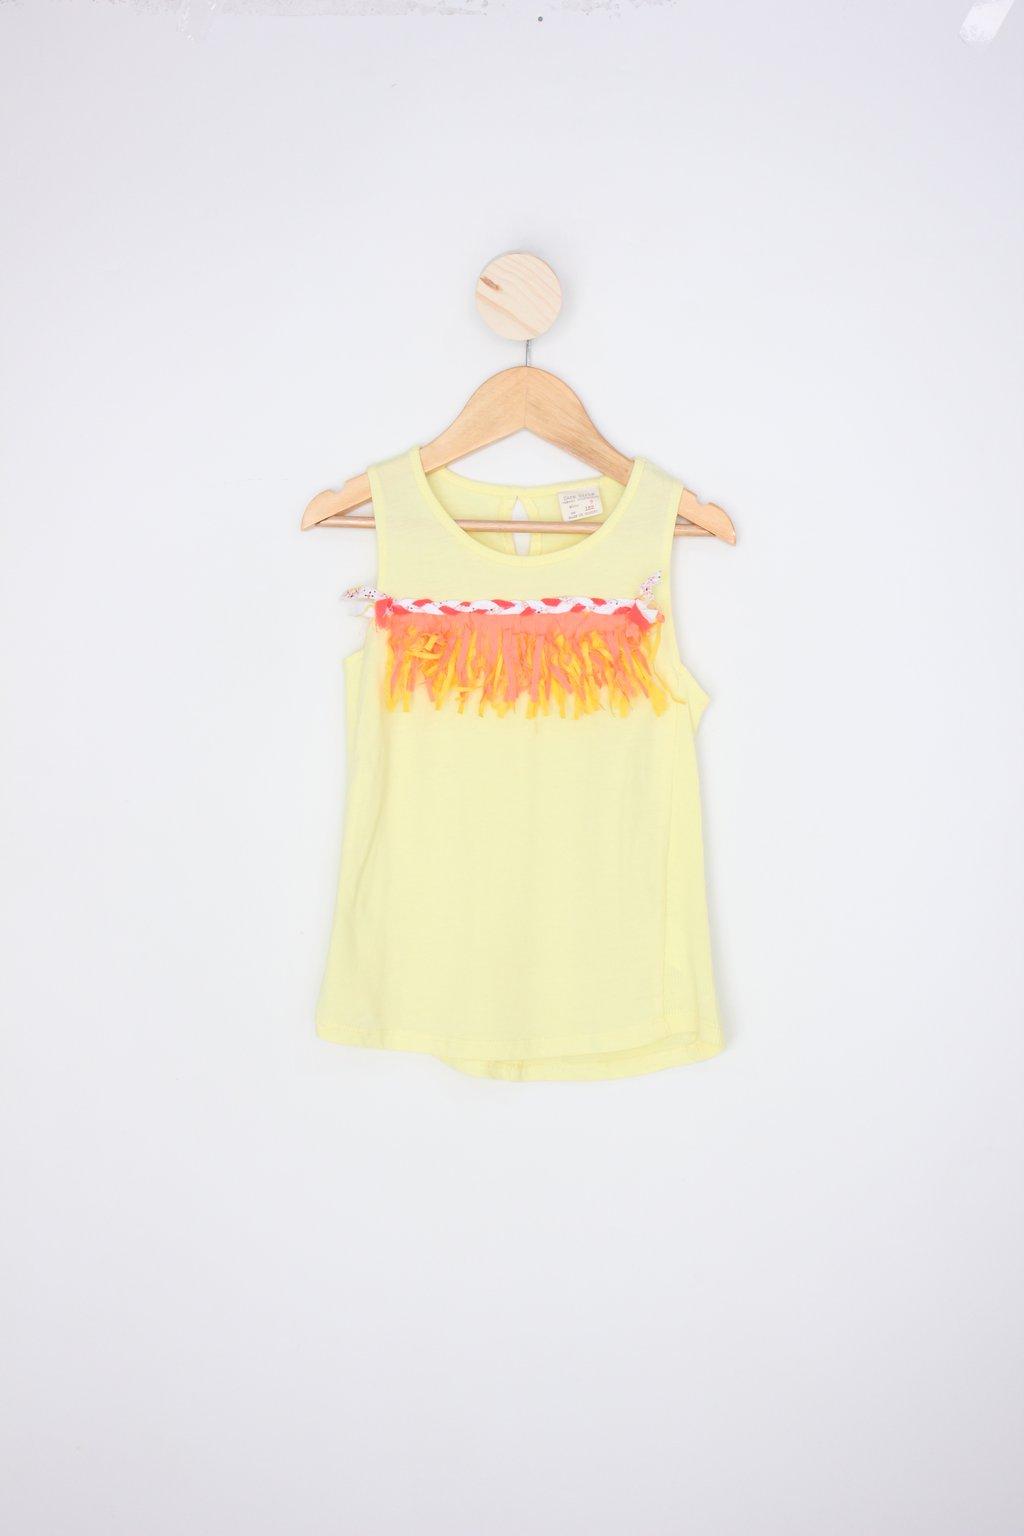 Regata Zara Infantil Amarela Com Franja Colorida